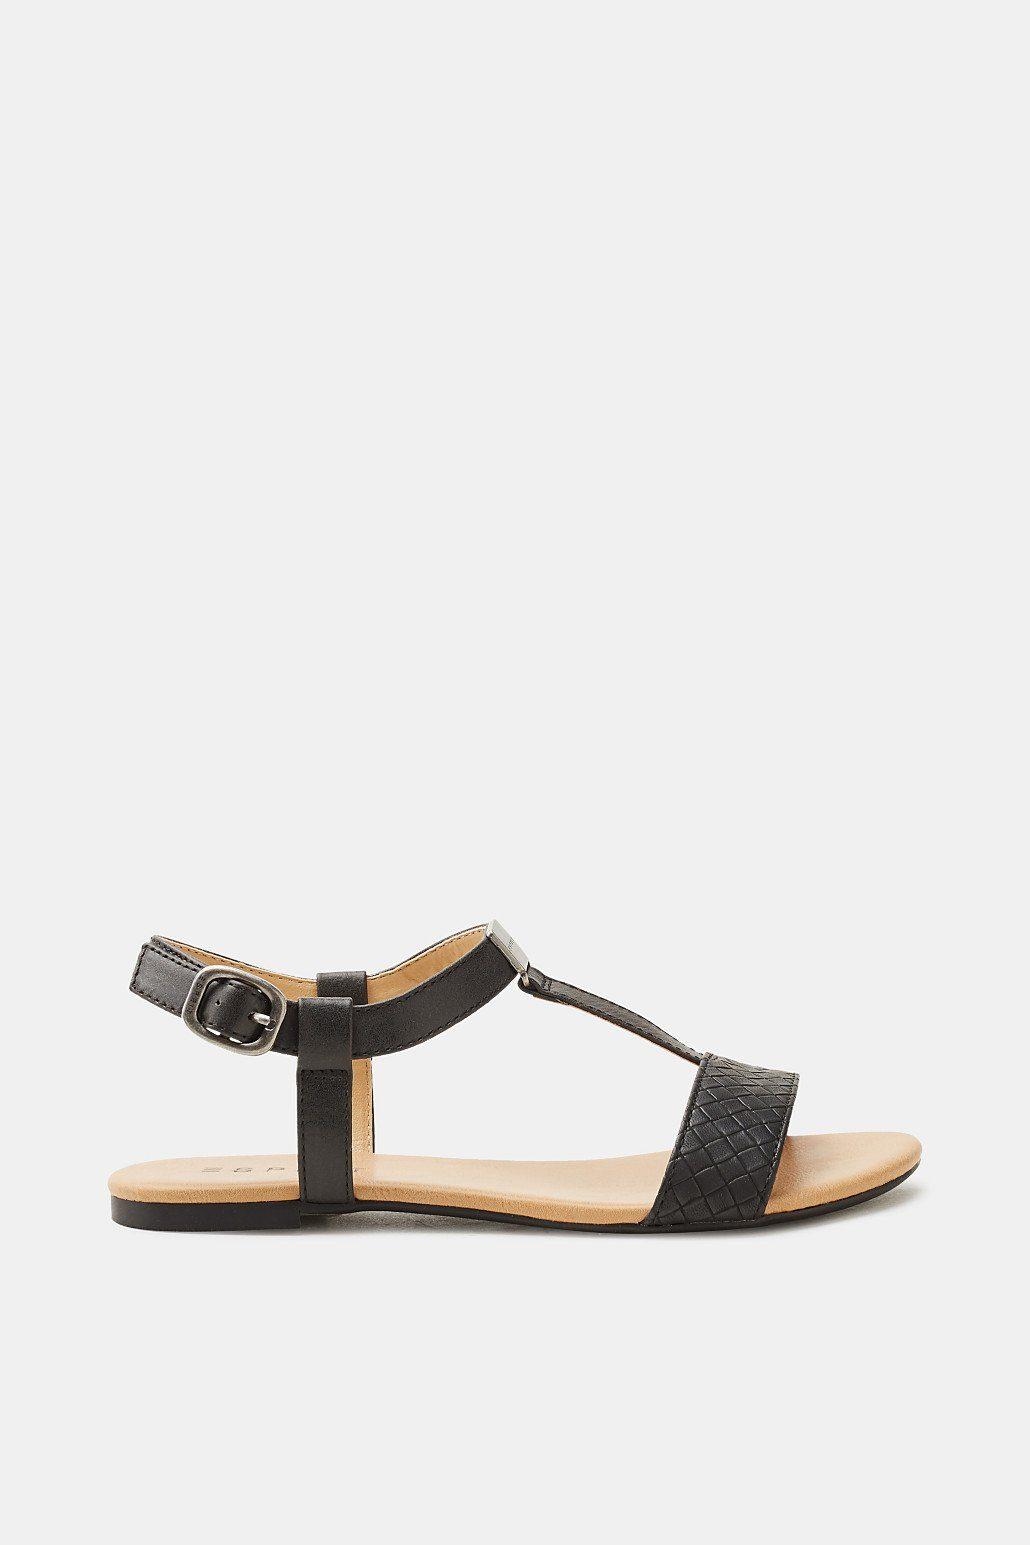 ESPRIT Flache Sandale in geflochtener Leder-Optik  BLACK